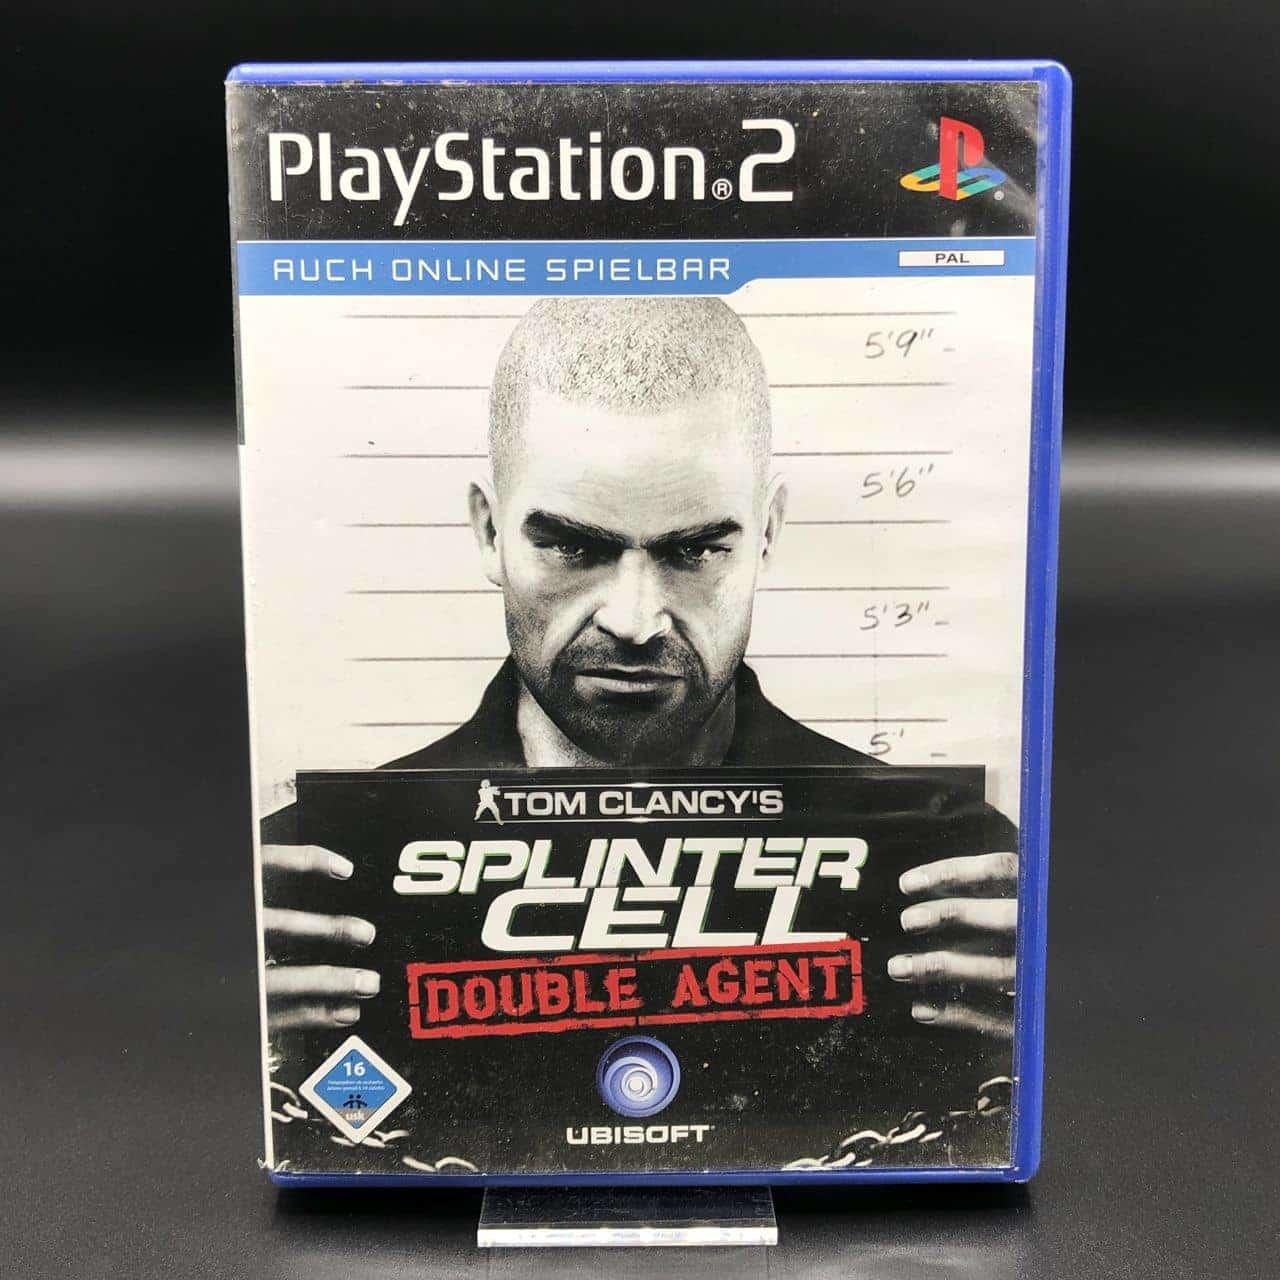 PS2 Tom Clancy's Splinter Cell: Double Agent (Komplett) (Gut) Sony PlayStation 2